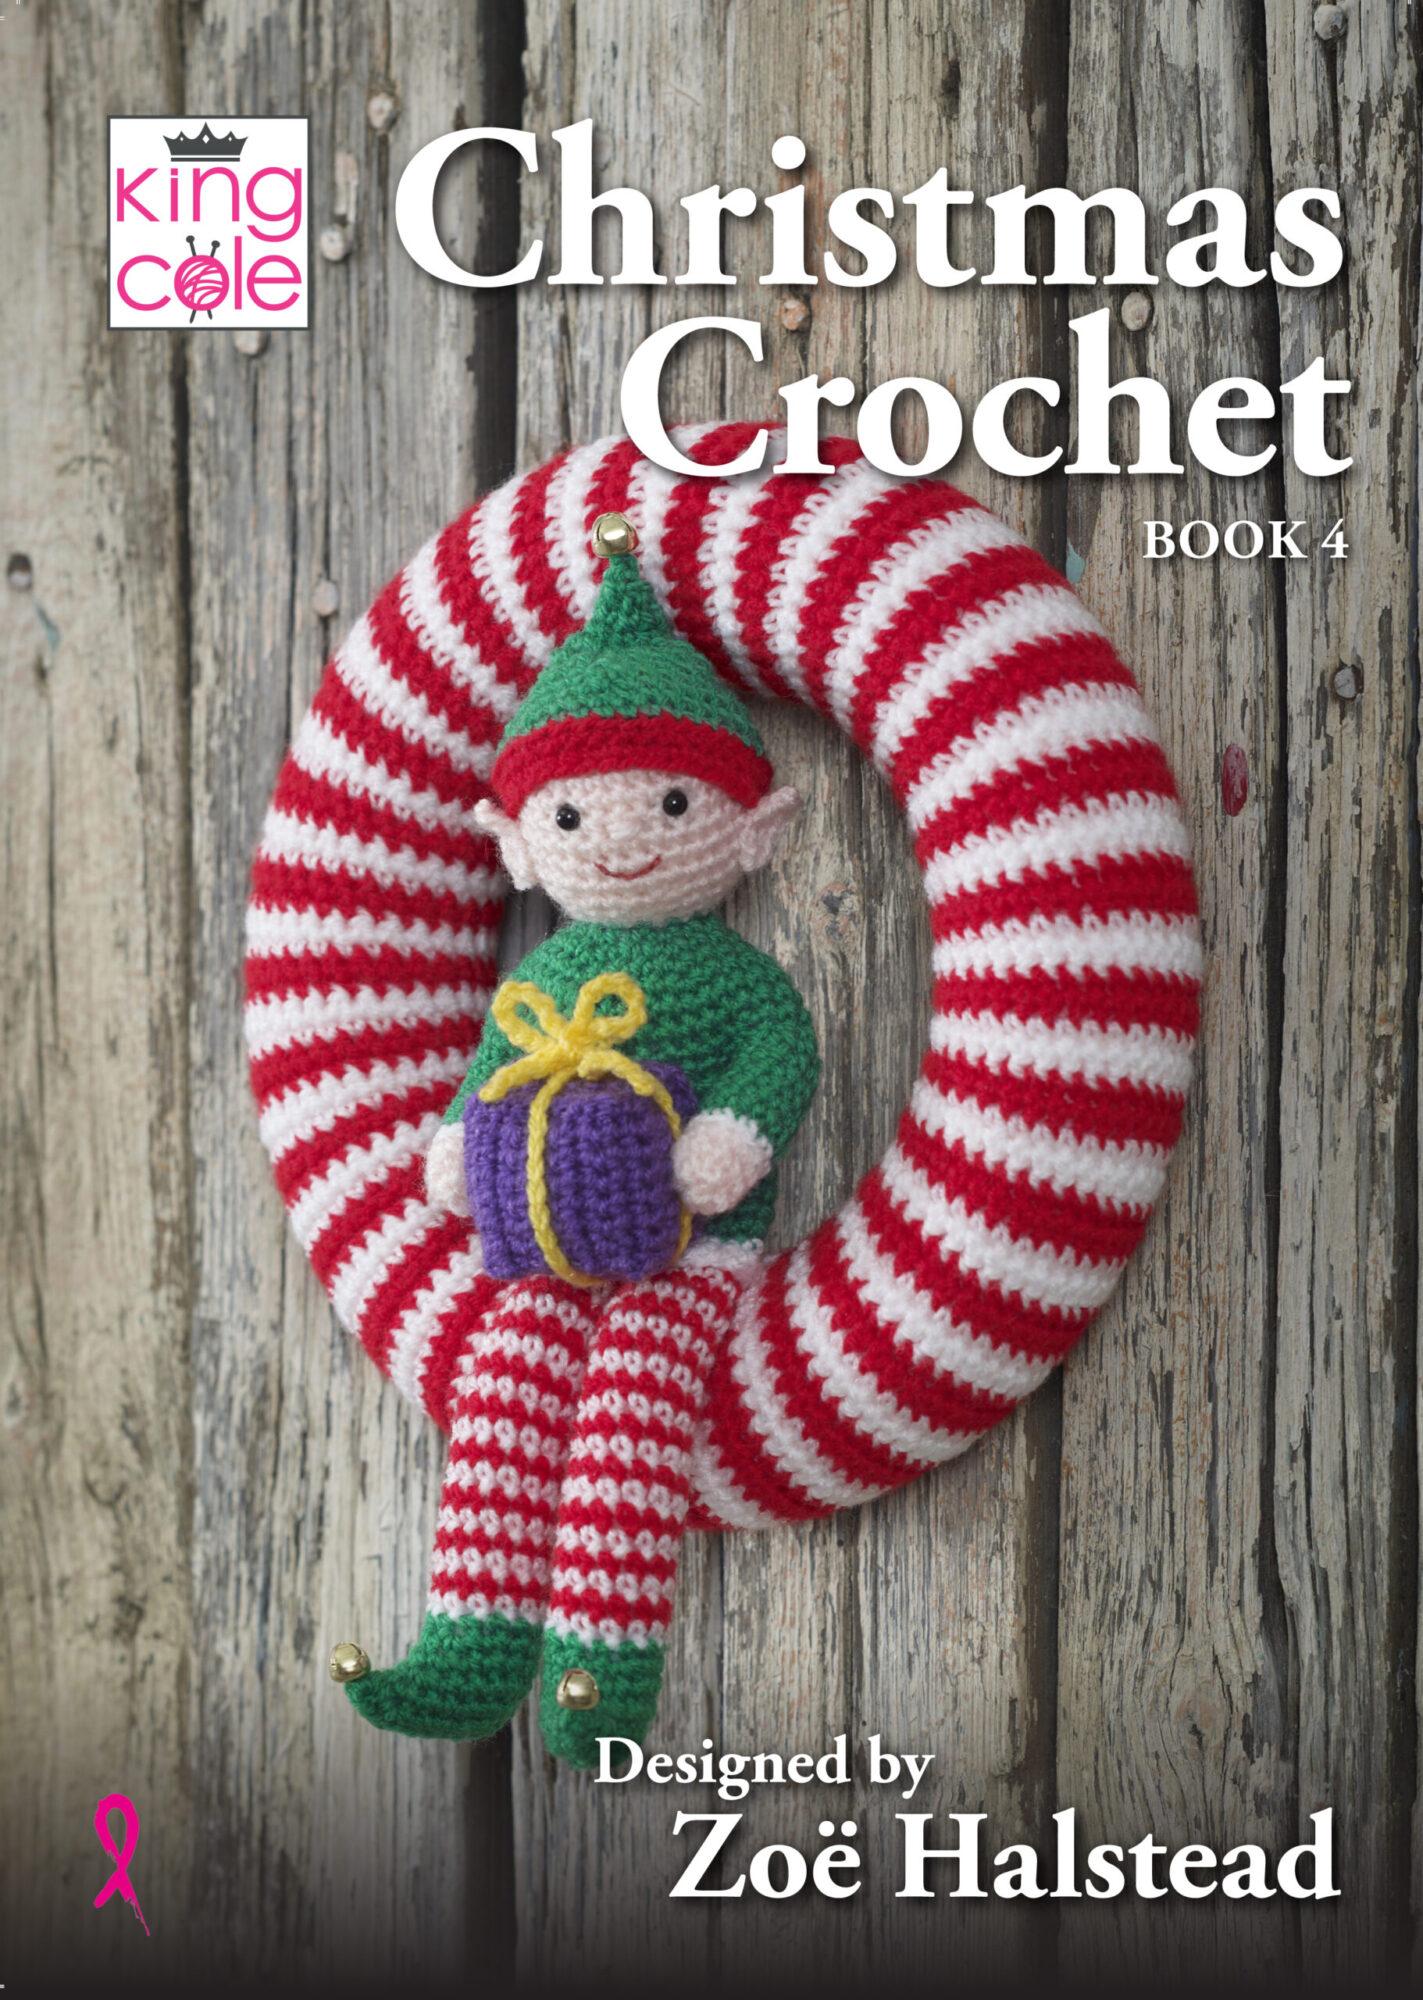 King Cole Christmas Crochet – Book 4 product image